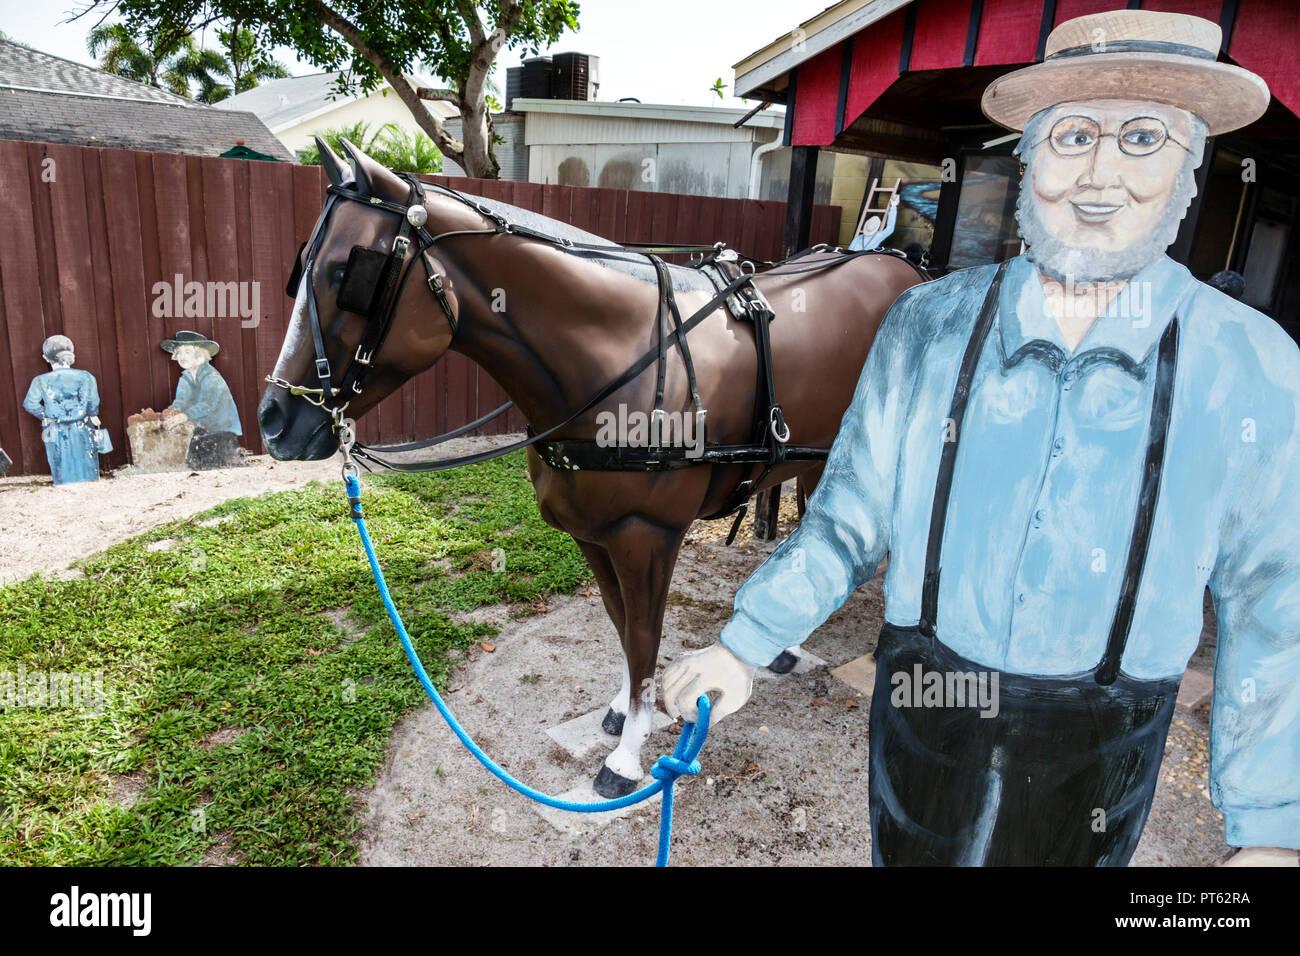 Sarasota Florida Pinecraft Pine Craft Amish community humor humour life-size cutout man horse buggy Stock Photo